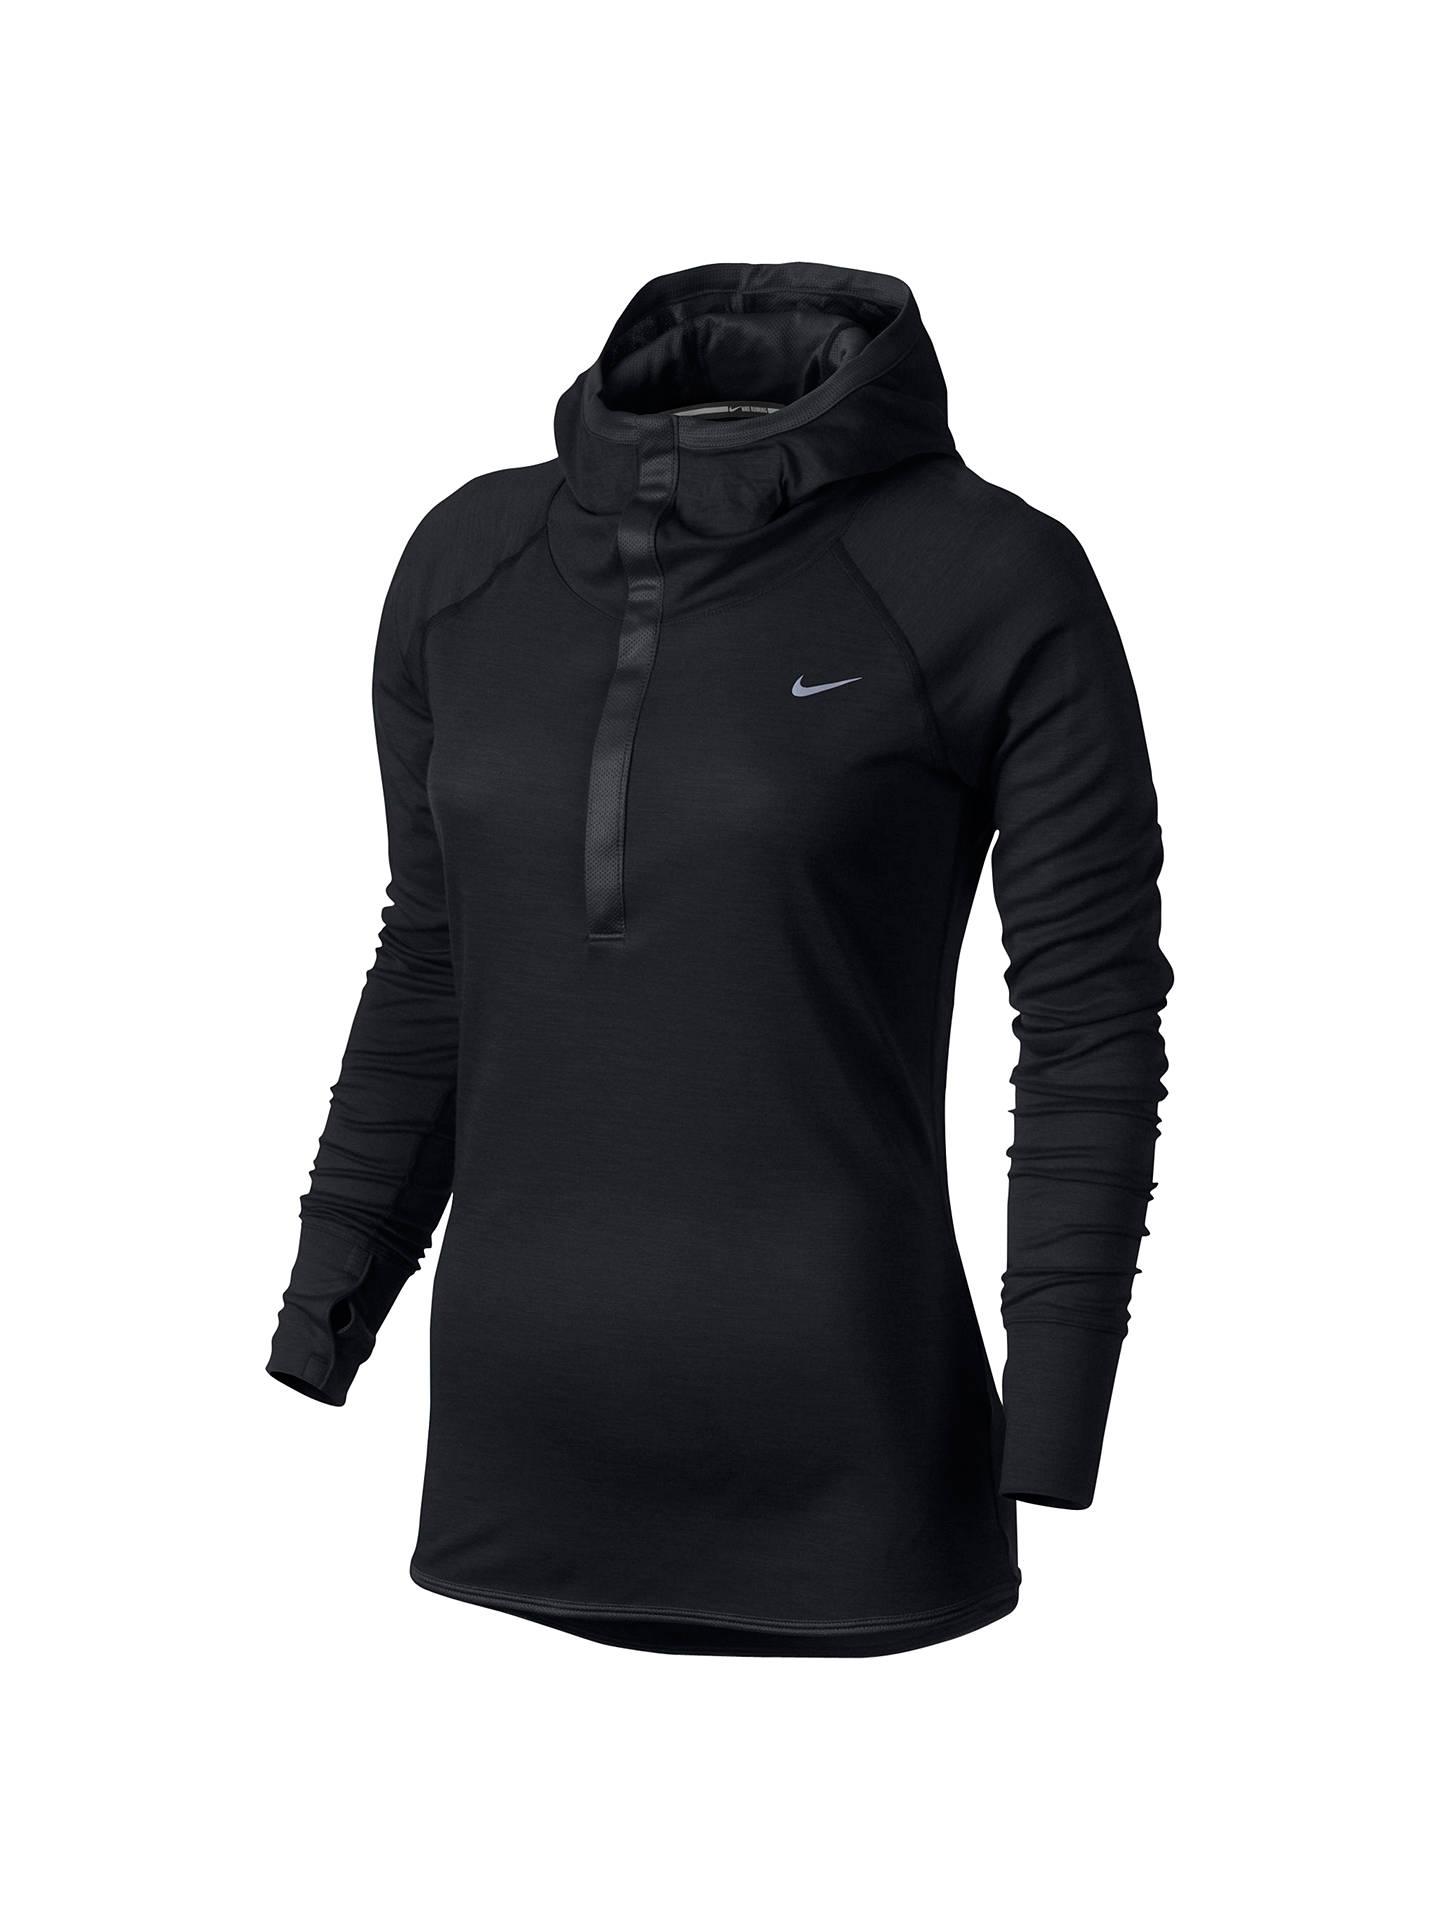 7a91cbc82 Buy Nike Wool Long Sleeve Running Hoodie, Black, XS Online at johnlewis.com  ...